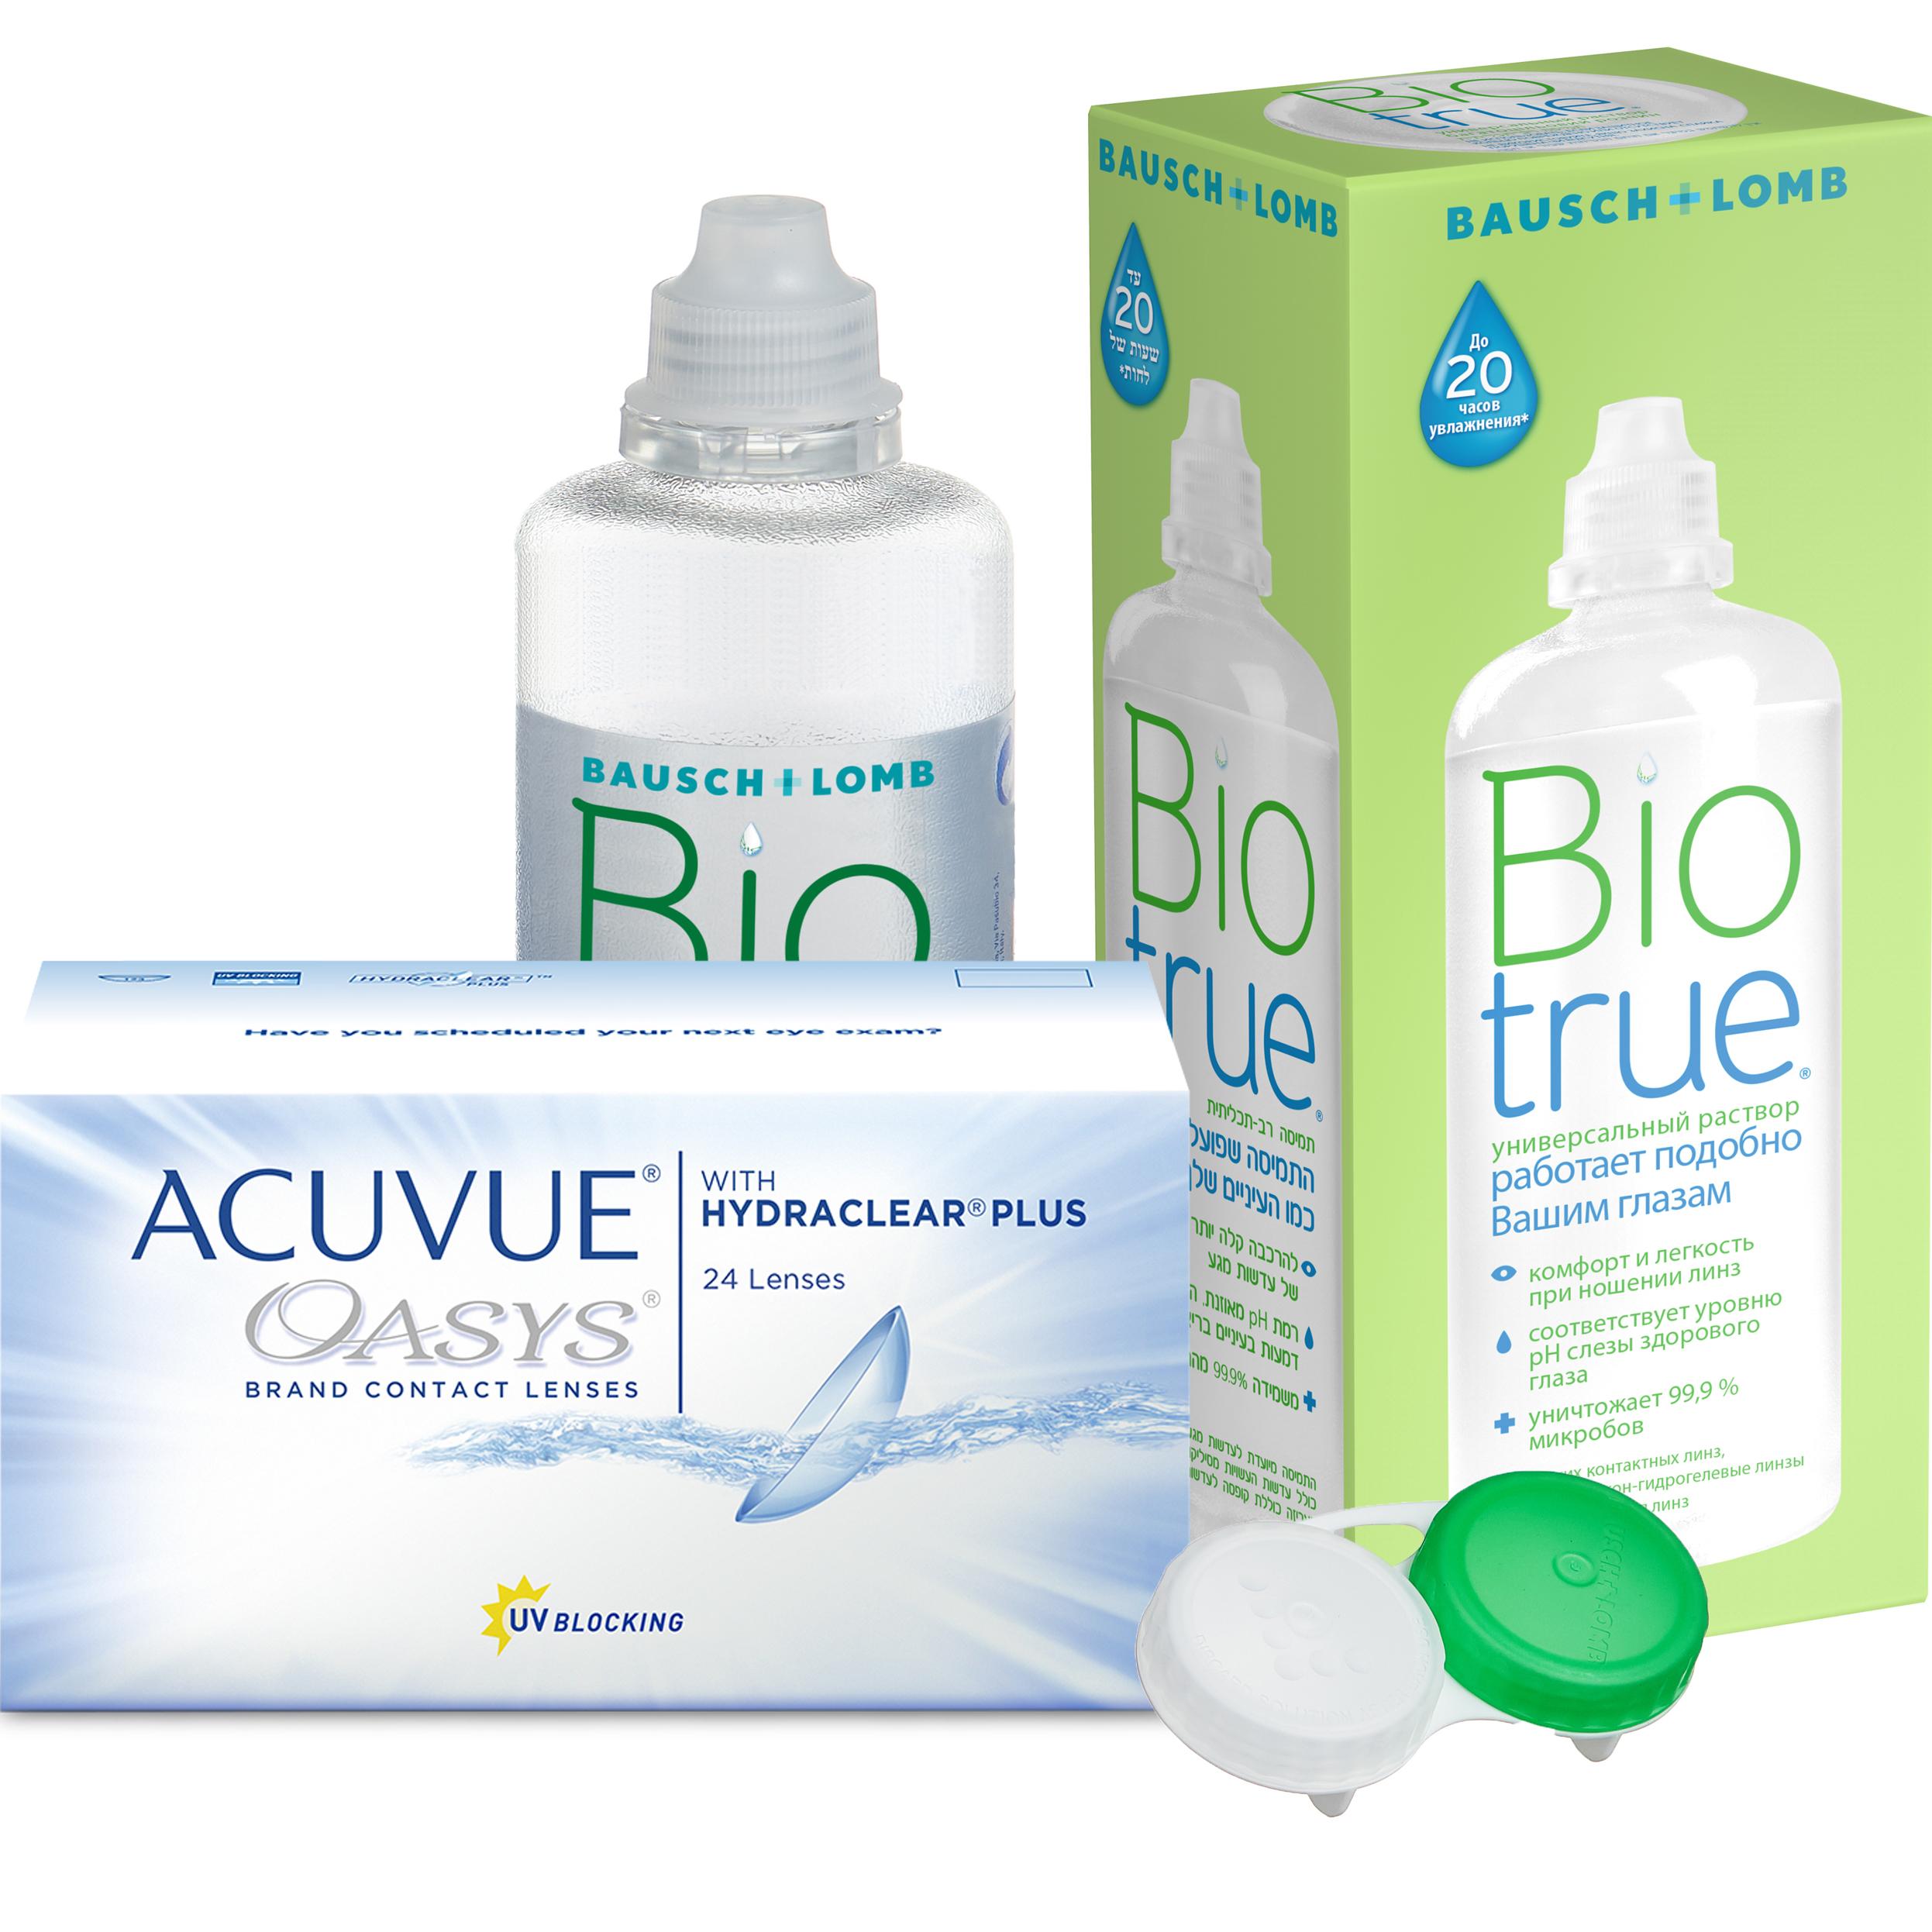 Купить Oasys with Hydraclear Plus 24 линзы + Biotrue, Контактные линзы Acuvue Oasys with Hydraclear Plus 24 линзы R 8.8 -0, 75 + Biotrue 300 мл